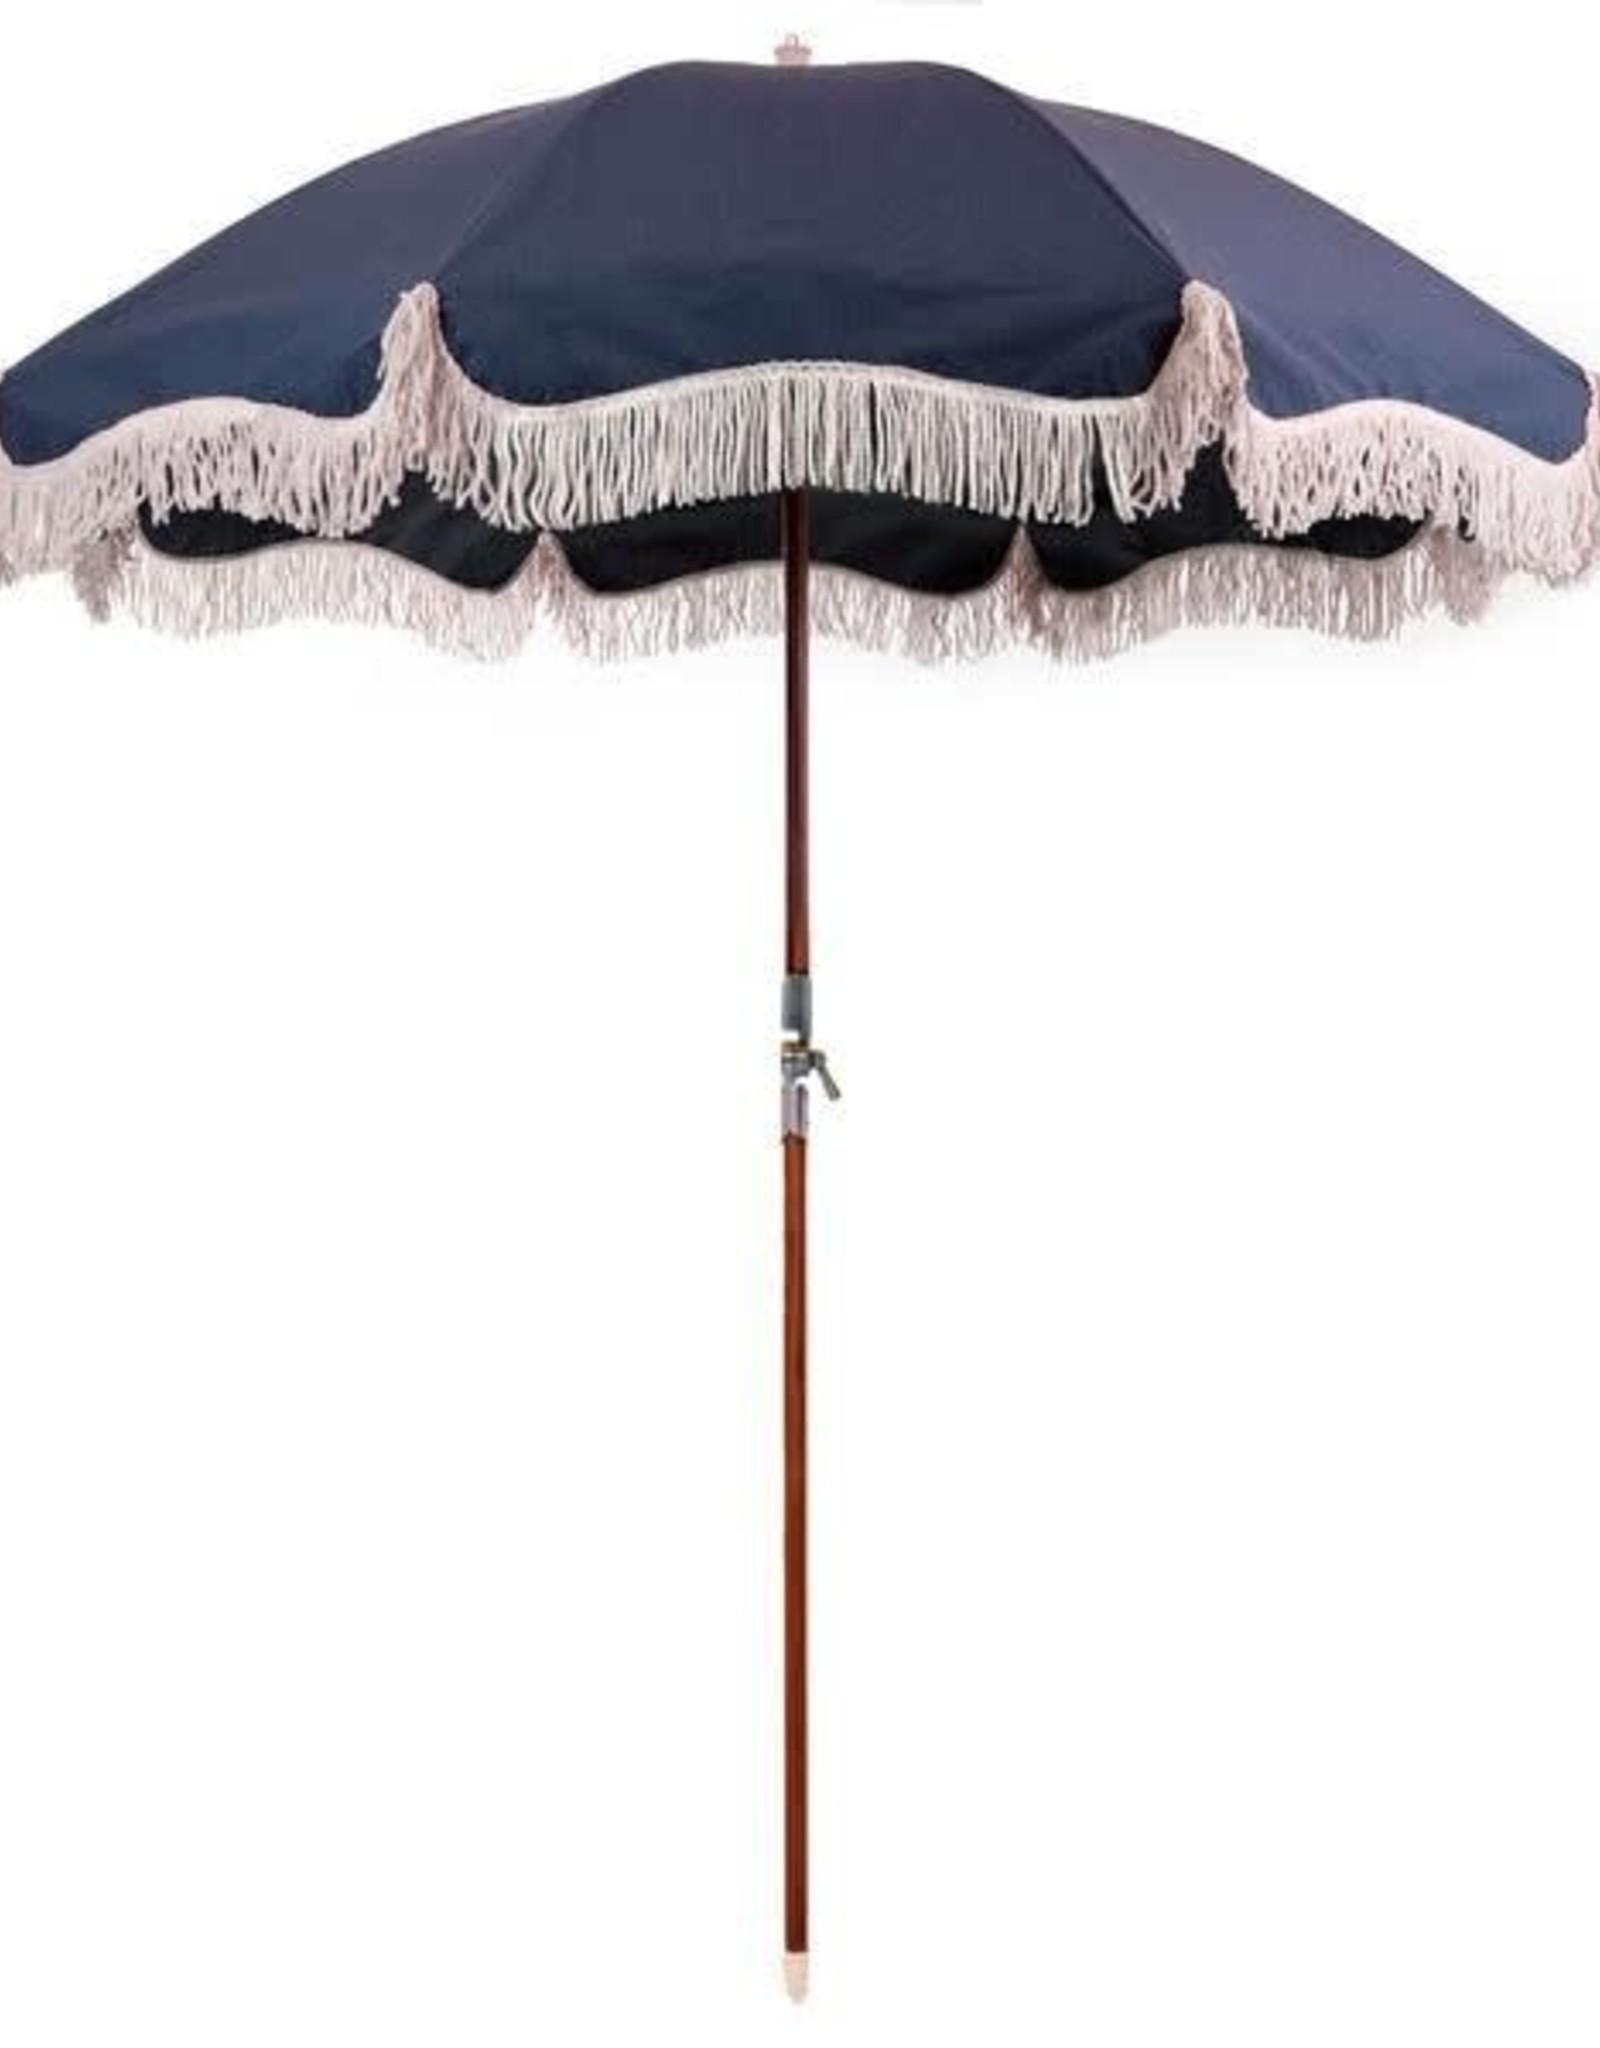 Home Premium Beach Umbrella - Boathouse Navy